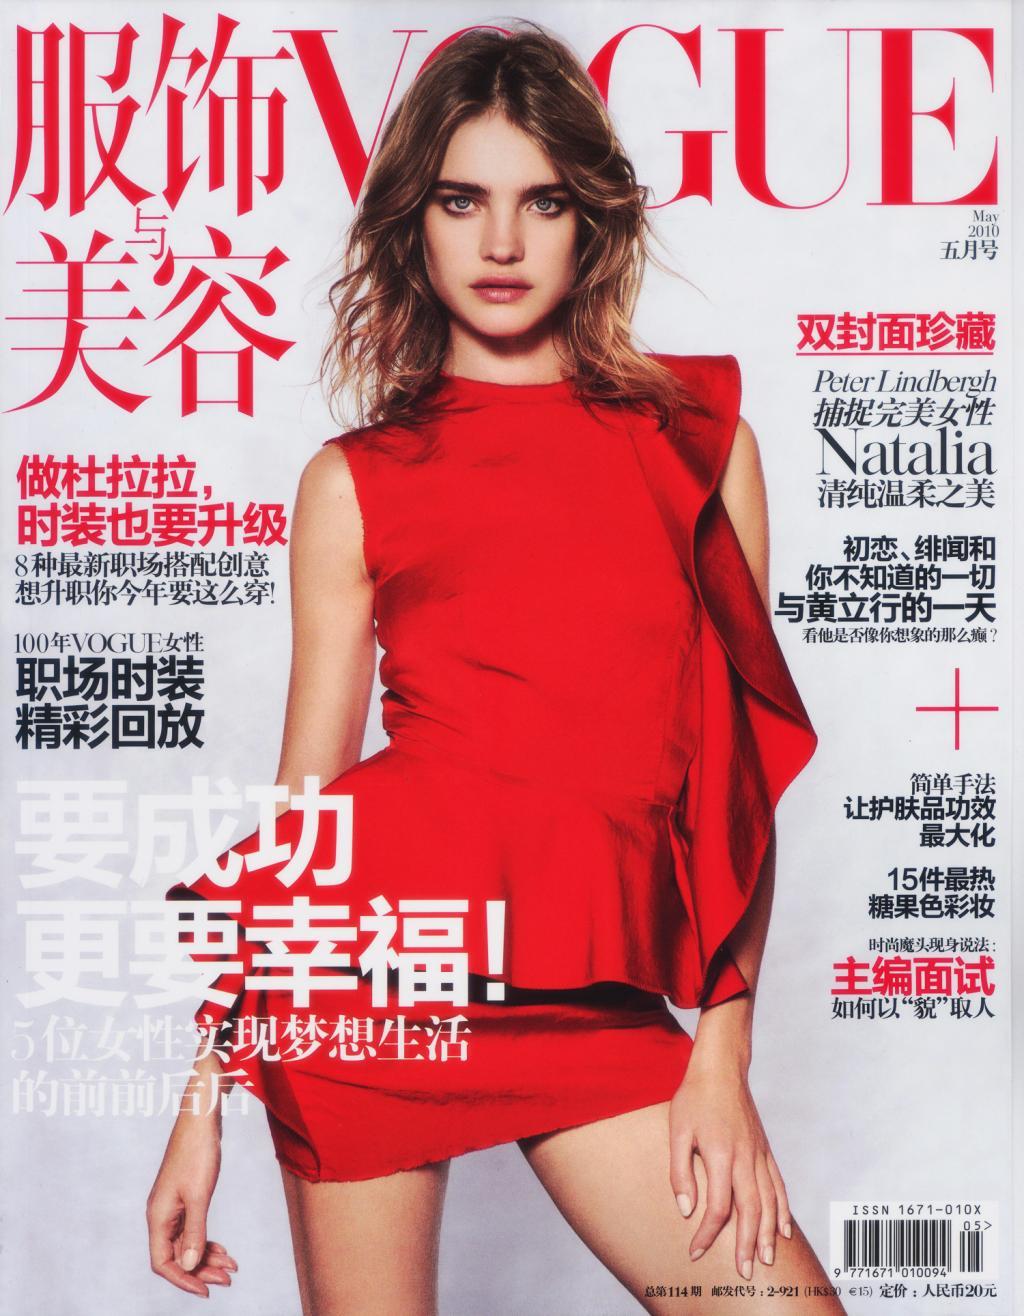 http://1.bp.blogspot.com/_5n424nUX5og/S9TpB_L3SJI/AAAAAAAANfY/0cM_Ku2thmI/s1600/Natalia+Vodianova+Vogue+China+2.jpg